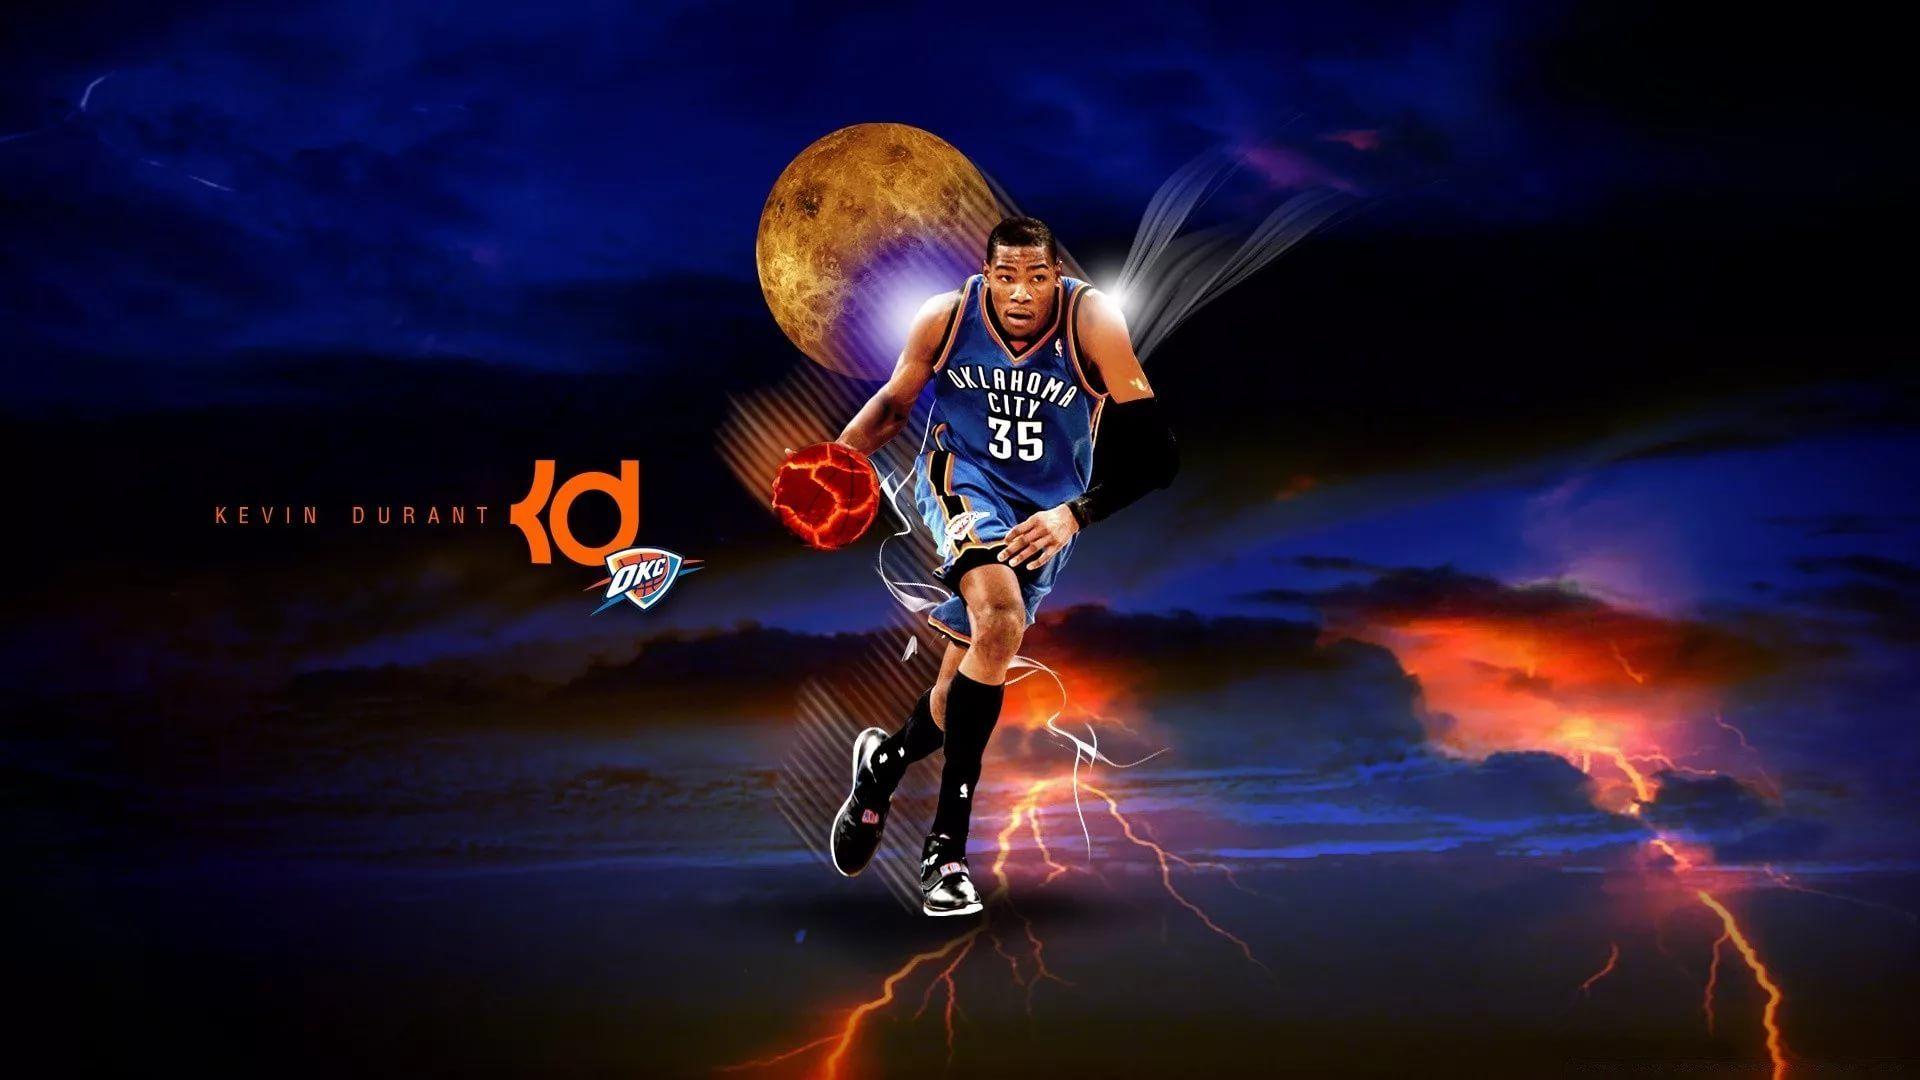 Kevin Durant wallpaper image hd